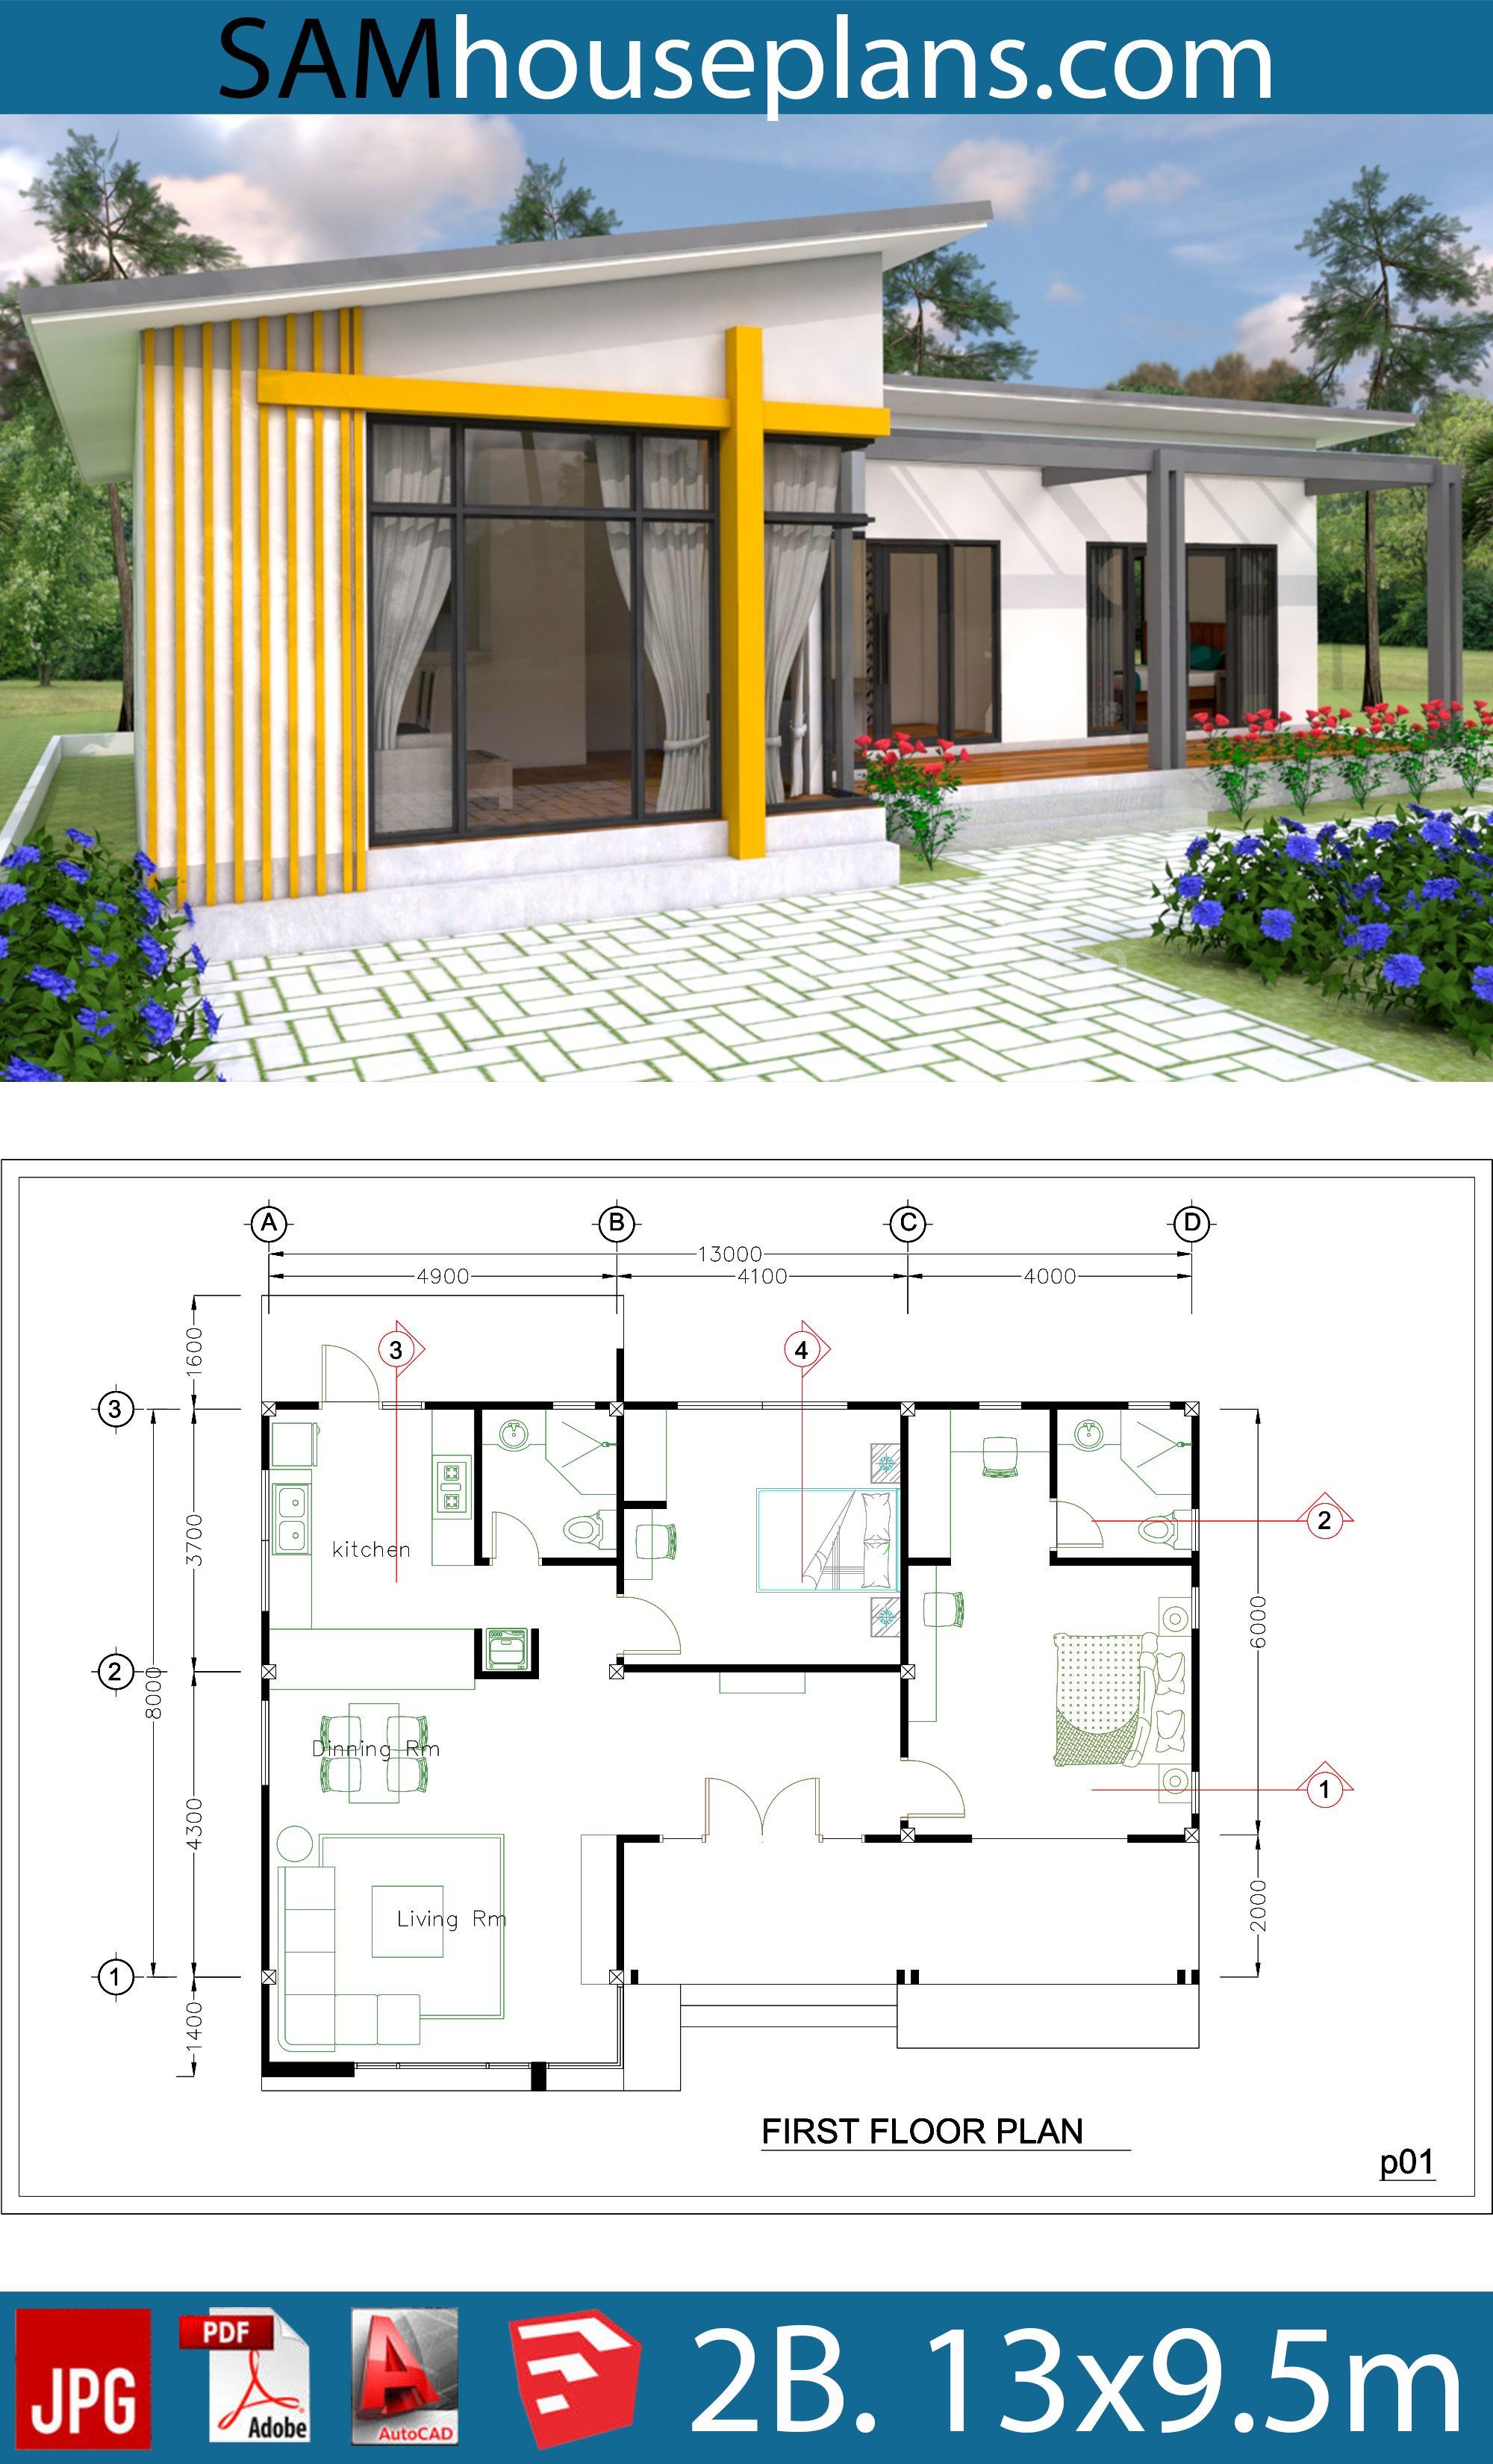 House Plans 13x9 5m Full Plan 2beds Sam House Plans House Plans Architectural Design House Plans House Design